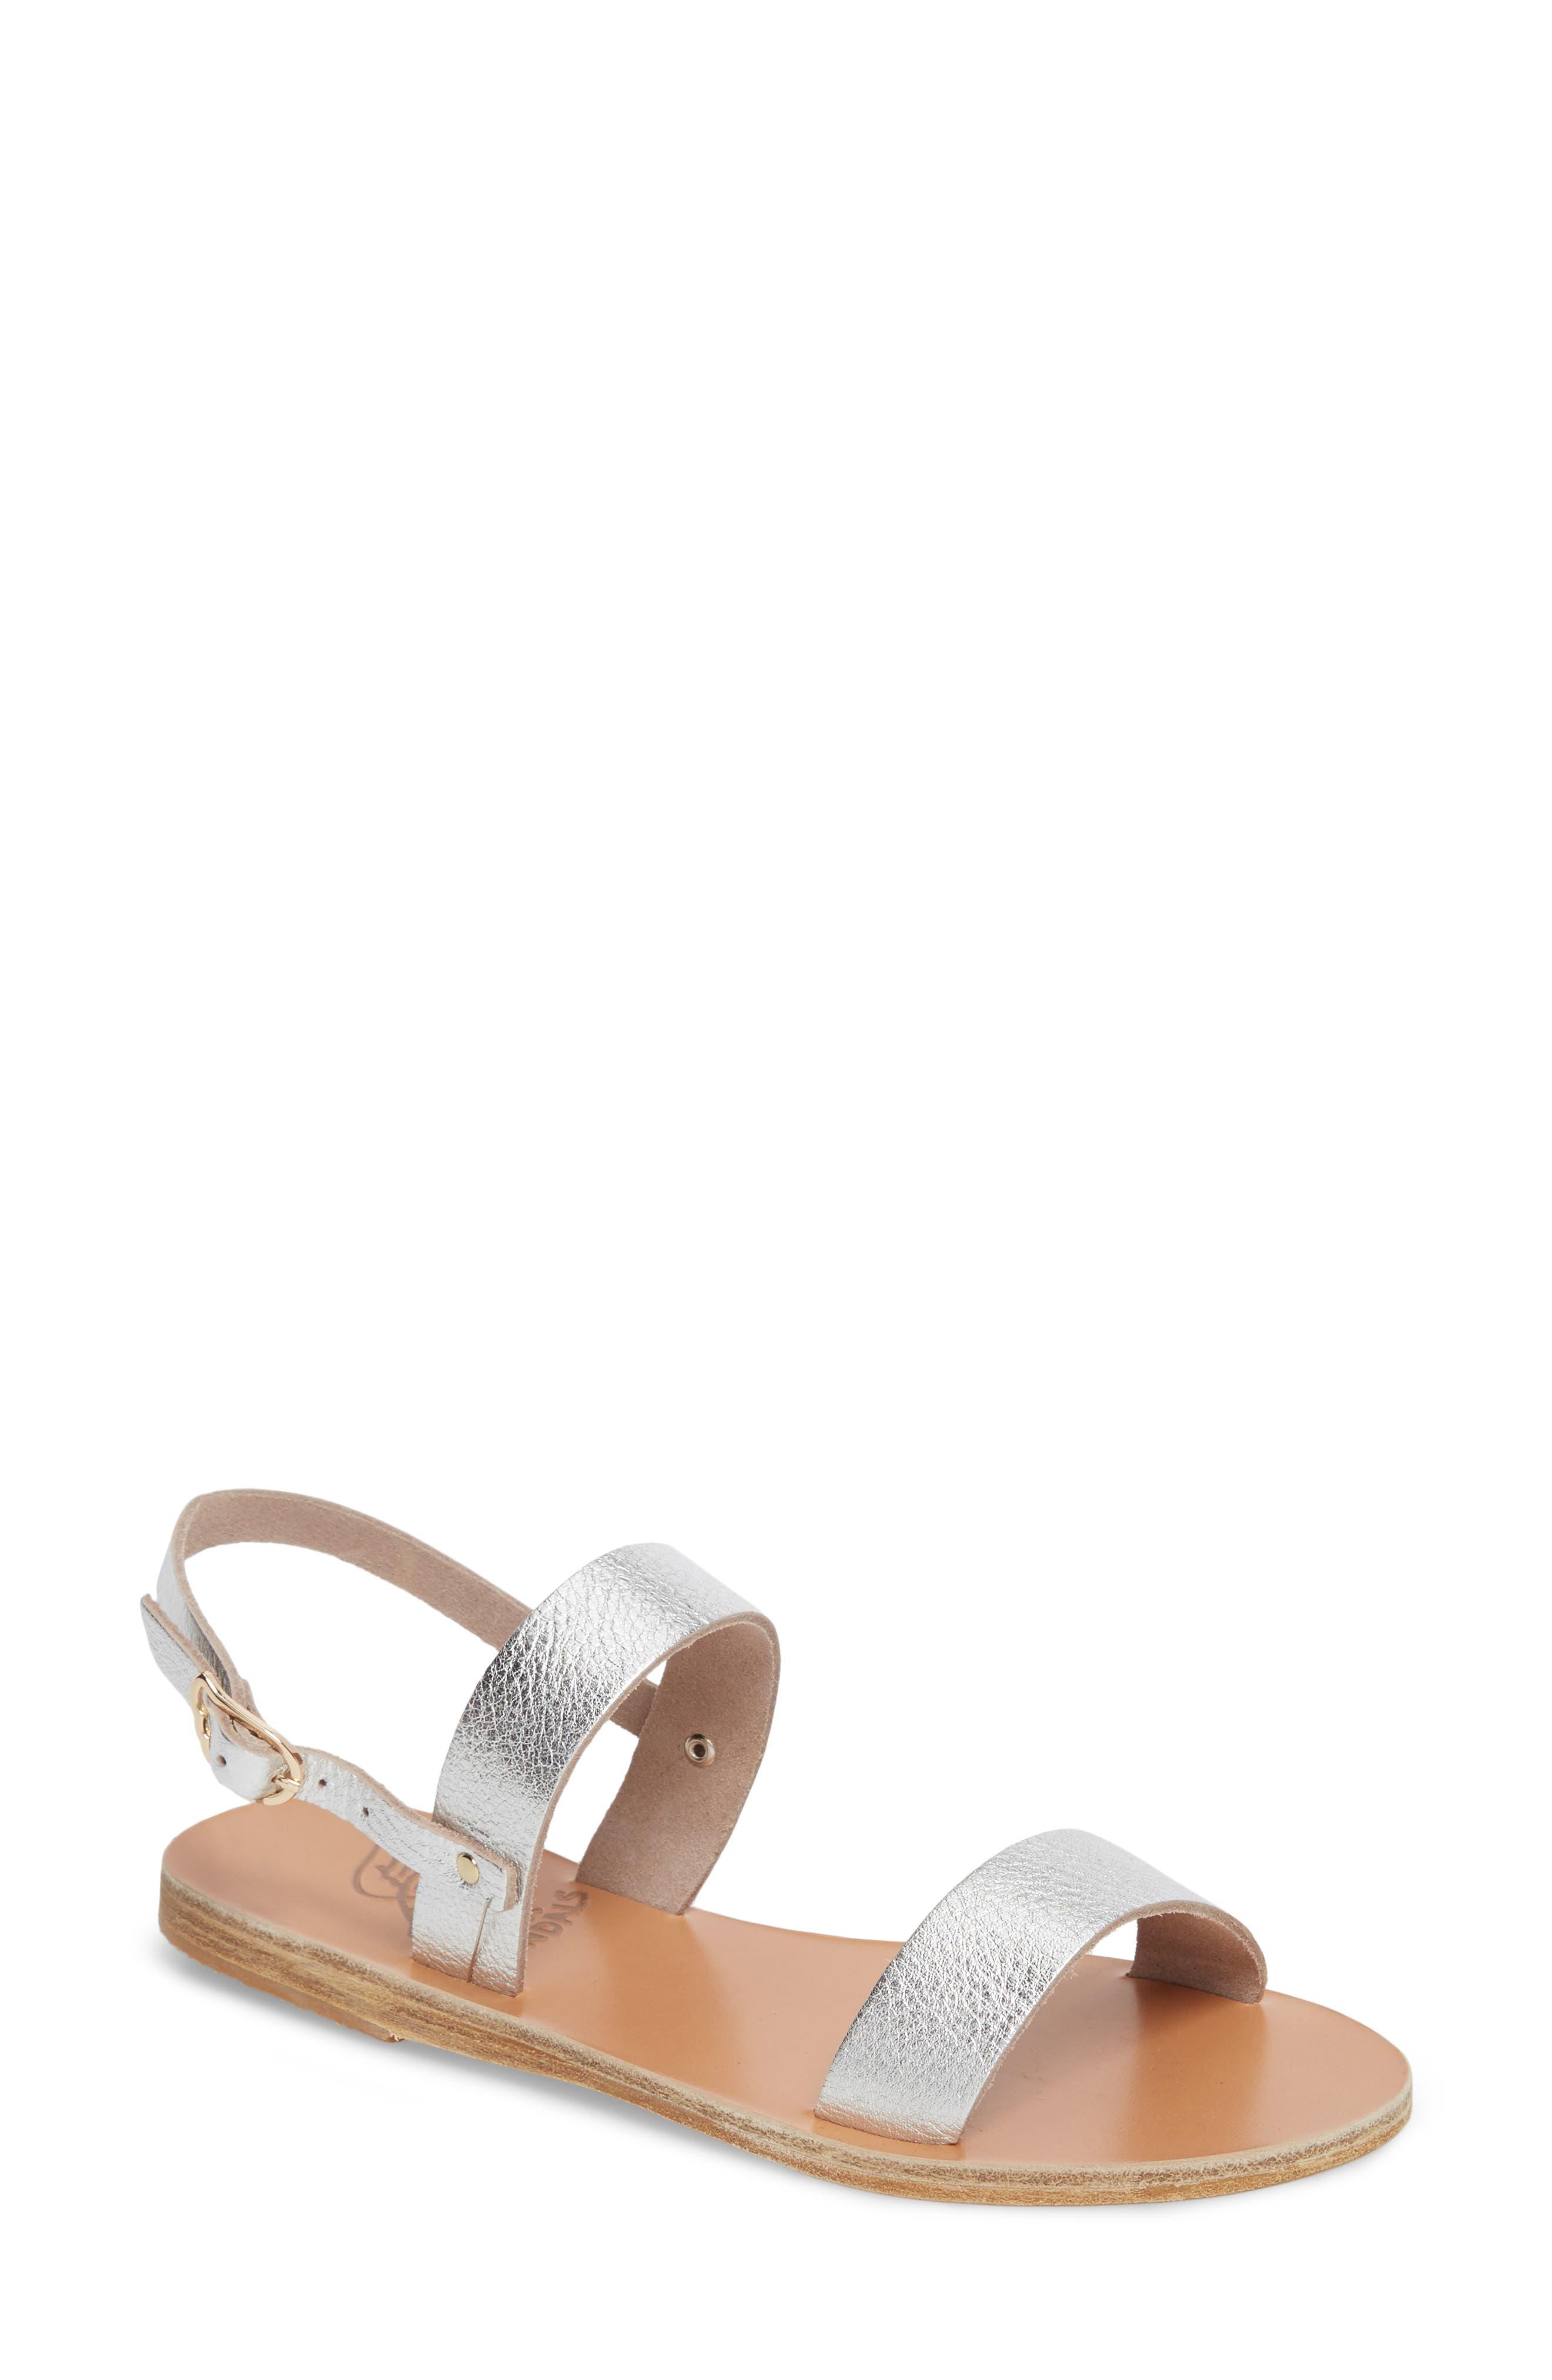 Main Image - Ancient Greek Sandals Clio Slingback Sandal (Women)